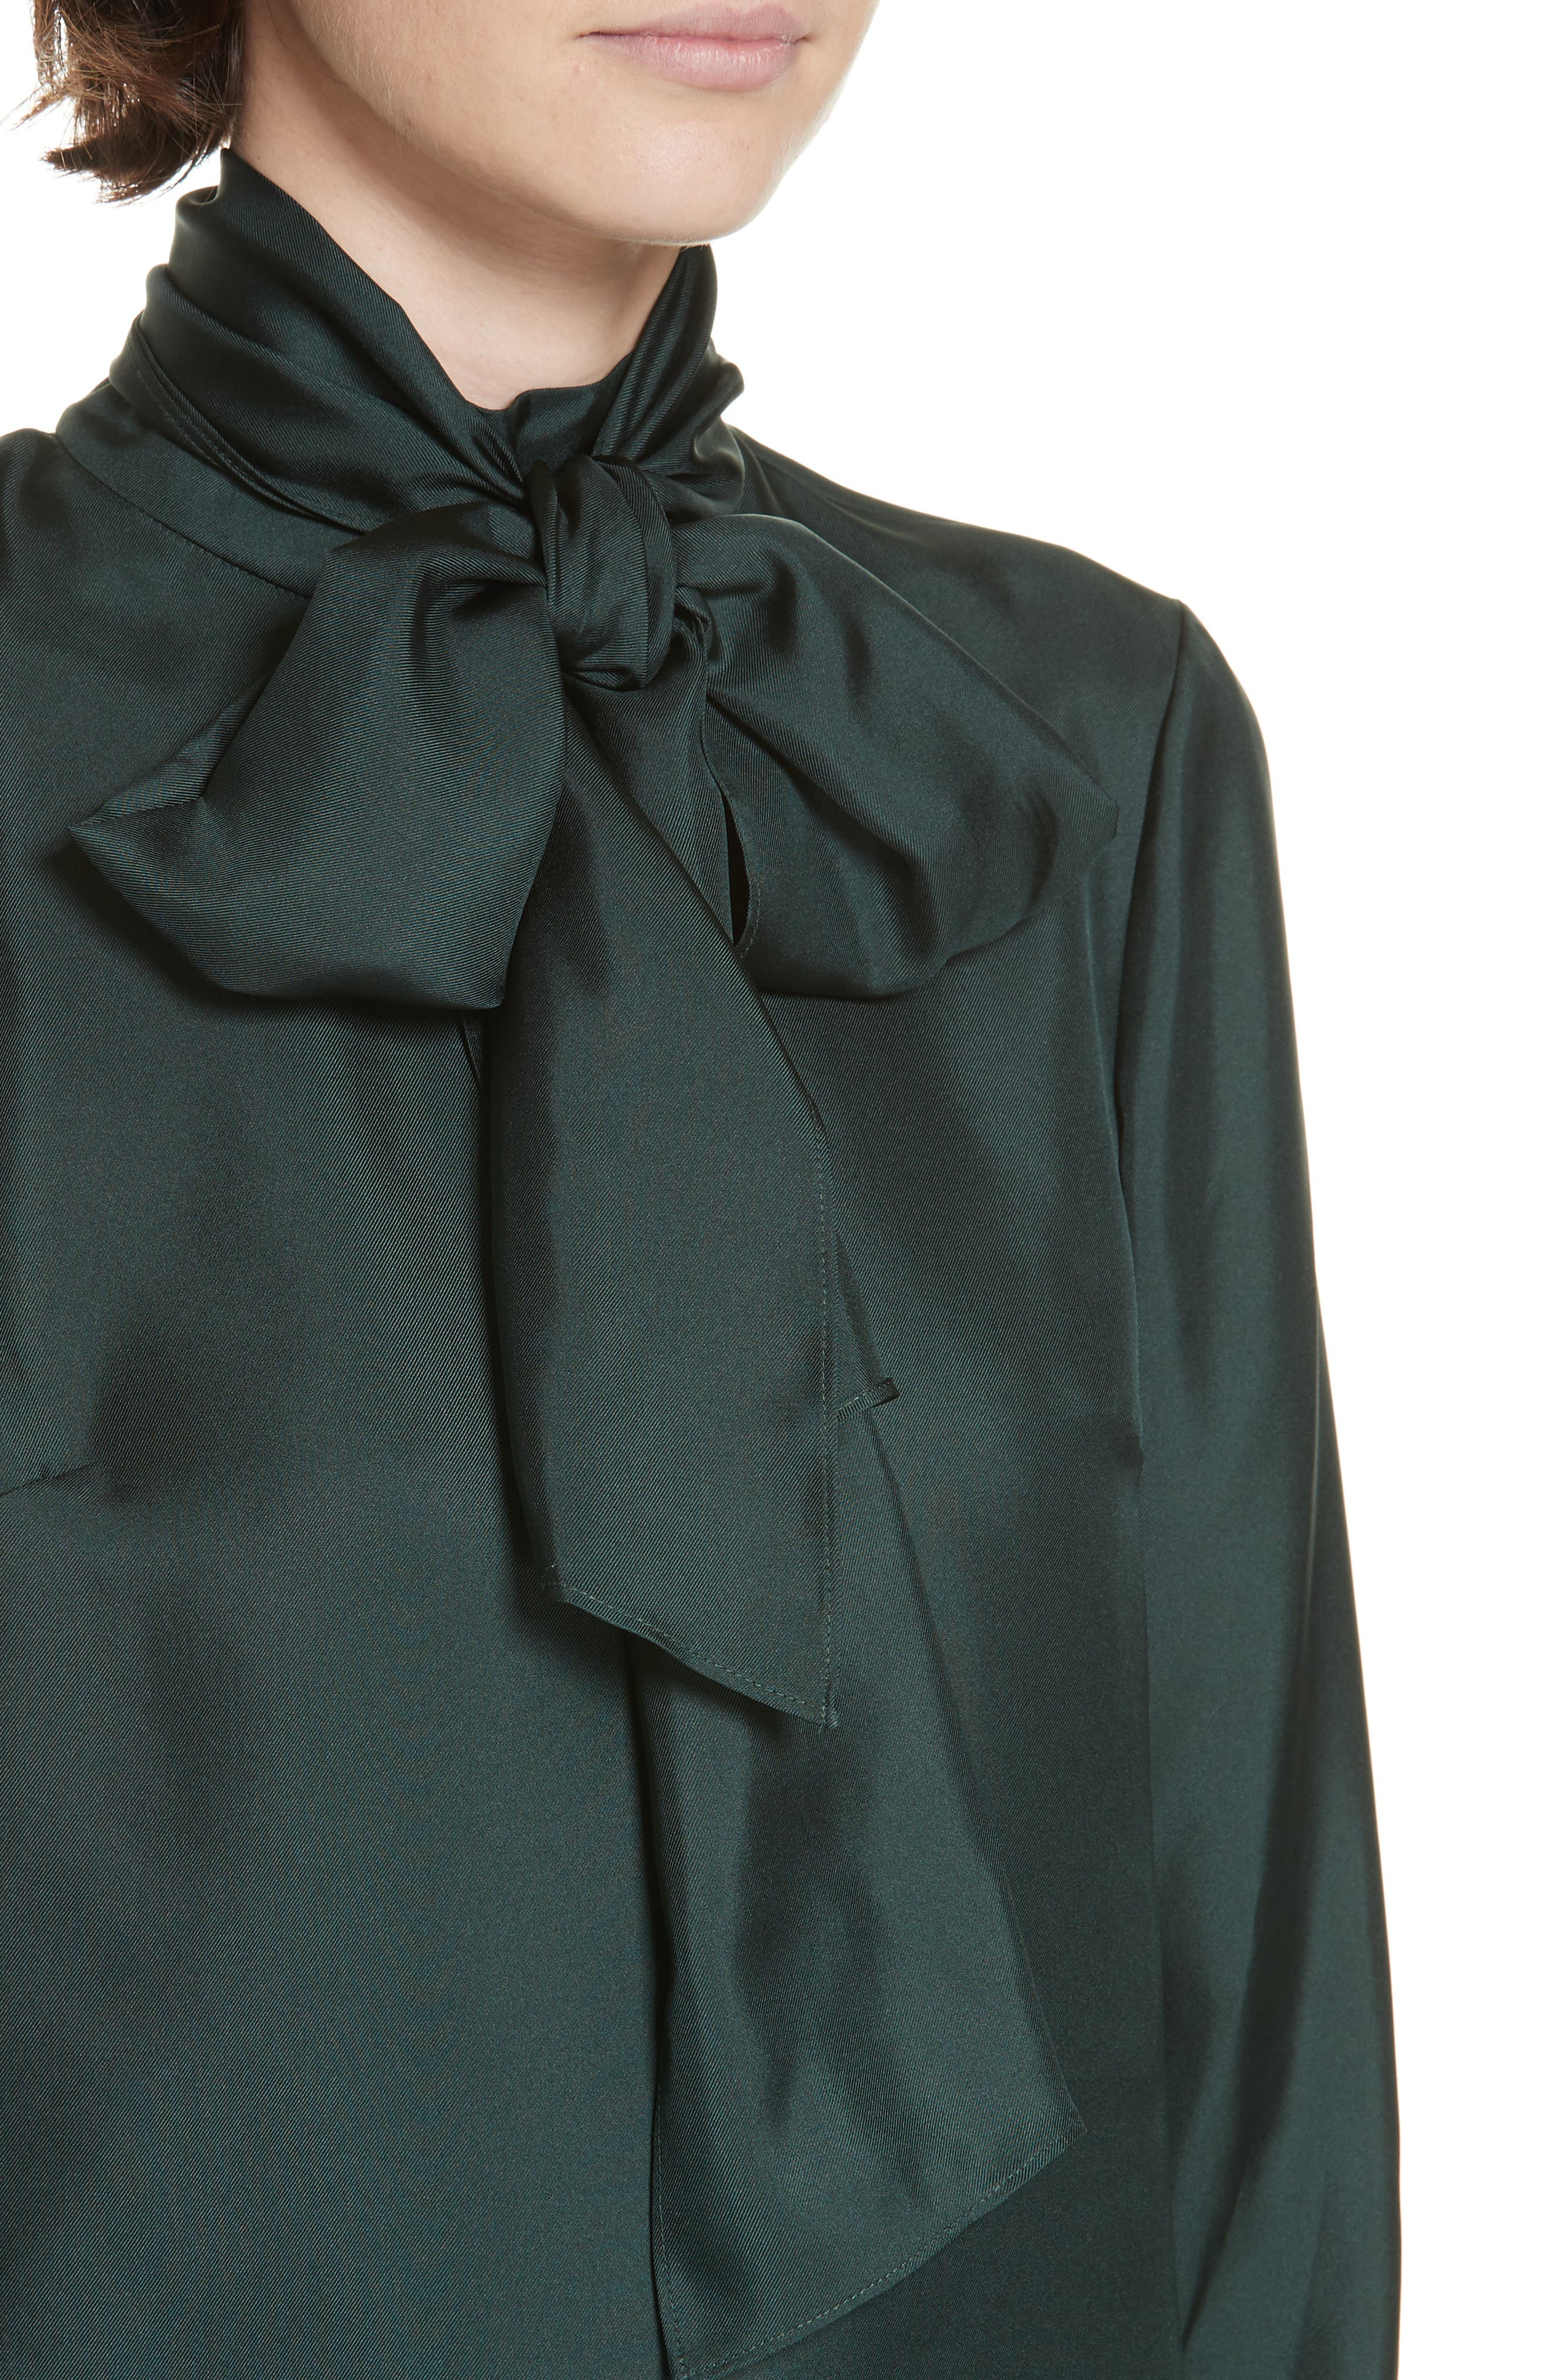 Marther Tie Neck Silk Blouse,                             Alternate thumbnail 4, color,                             DARK GREEN